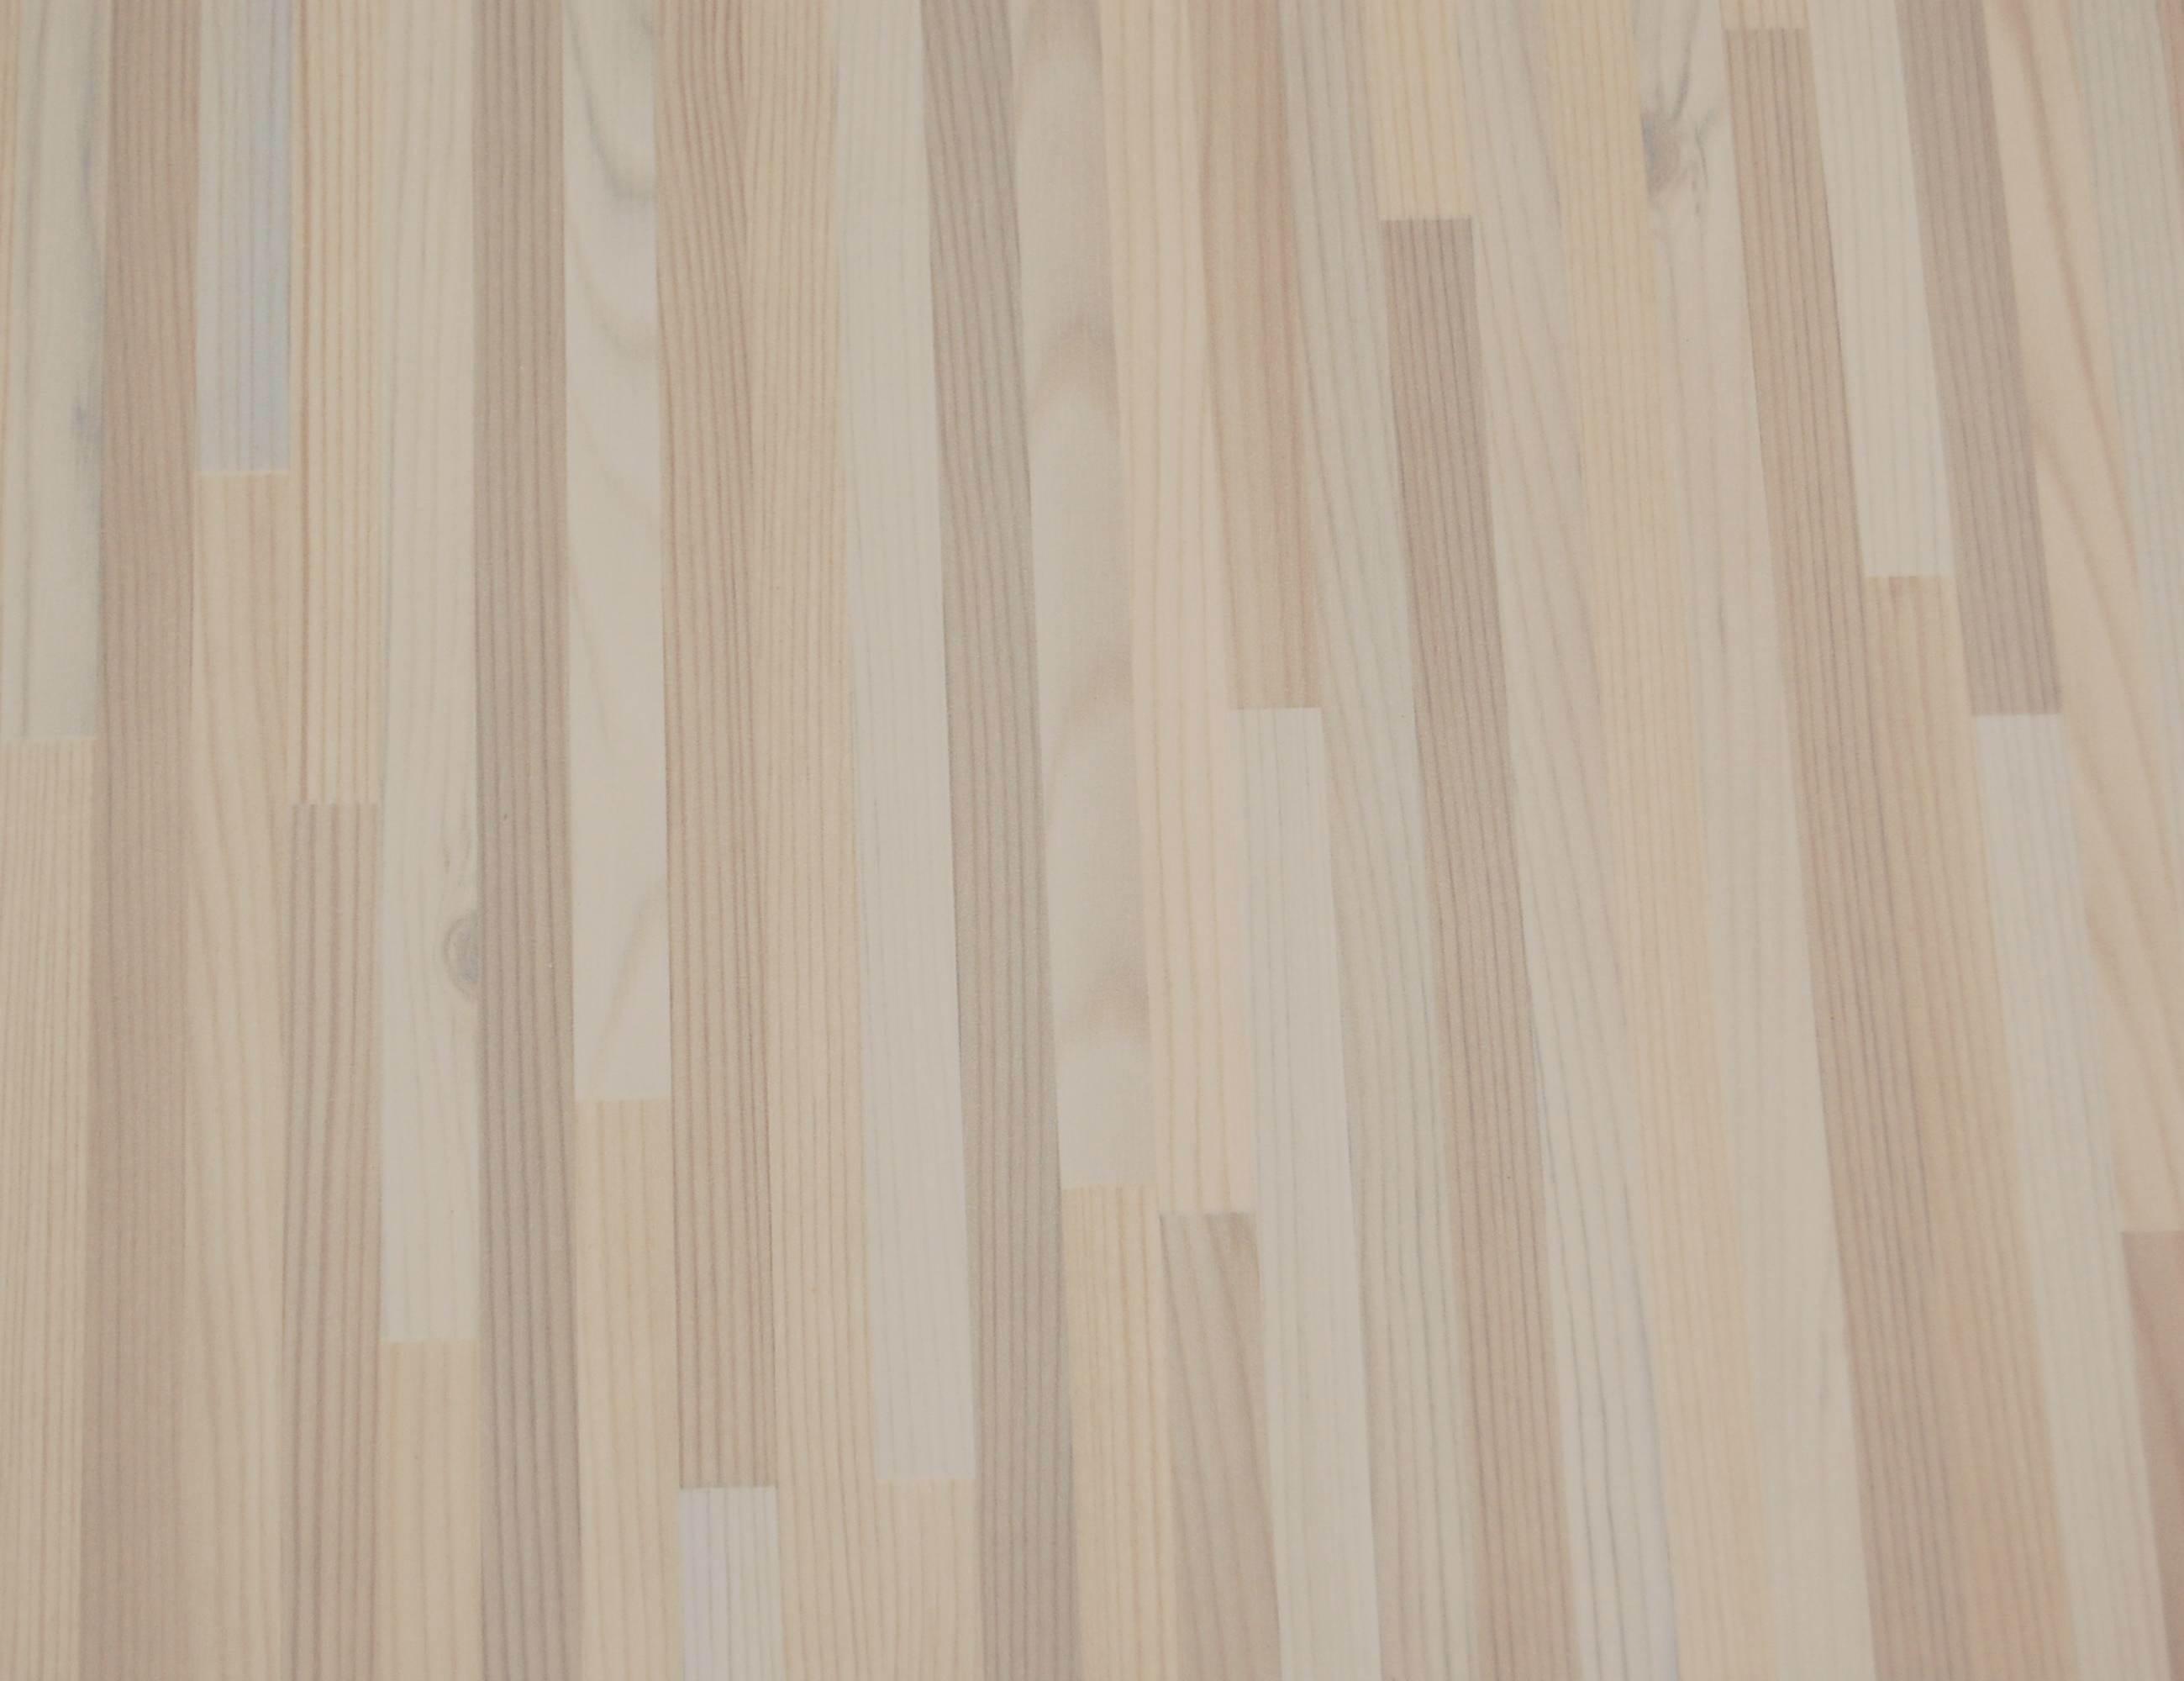 Laminate flooring wilsonart laminate flooring for Wilsonart flooring